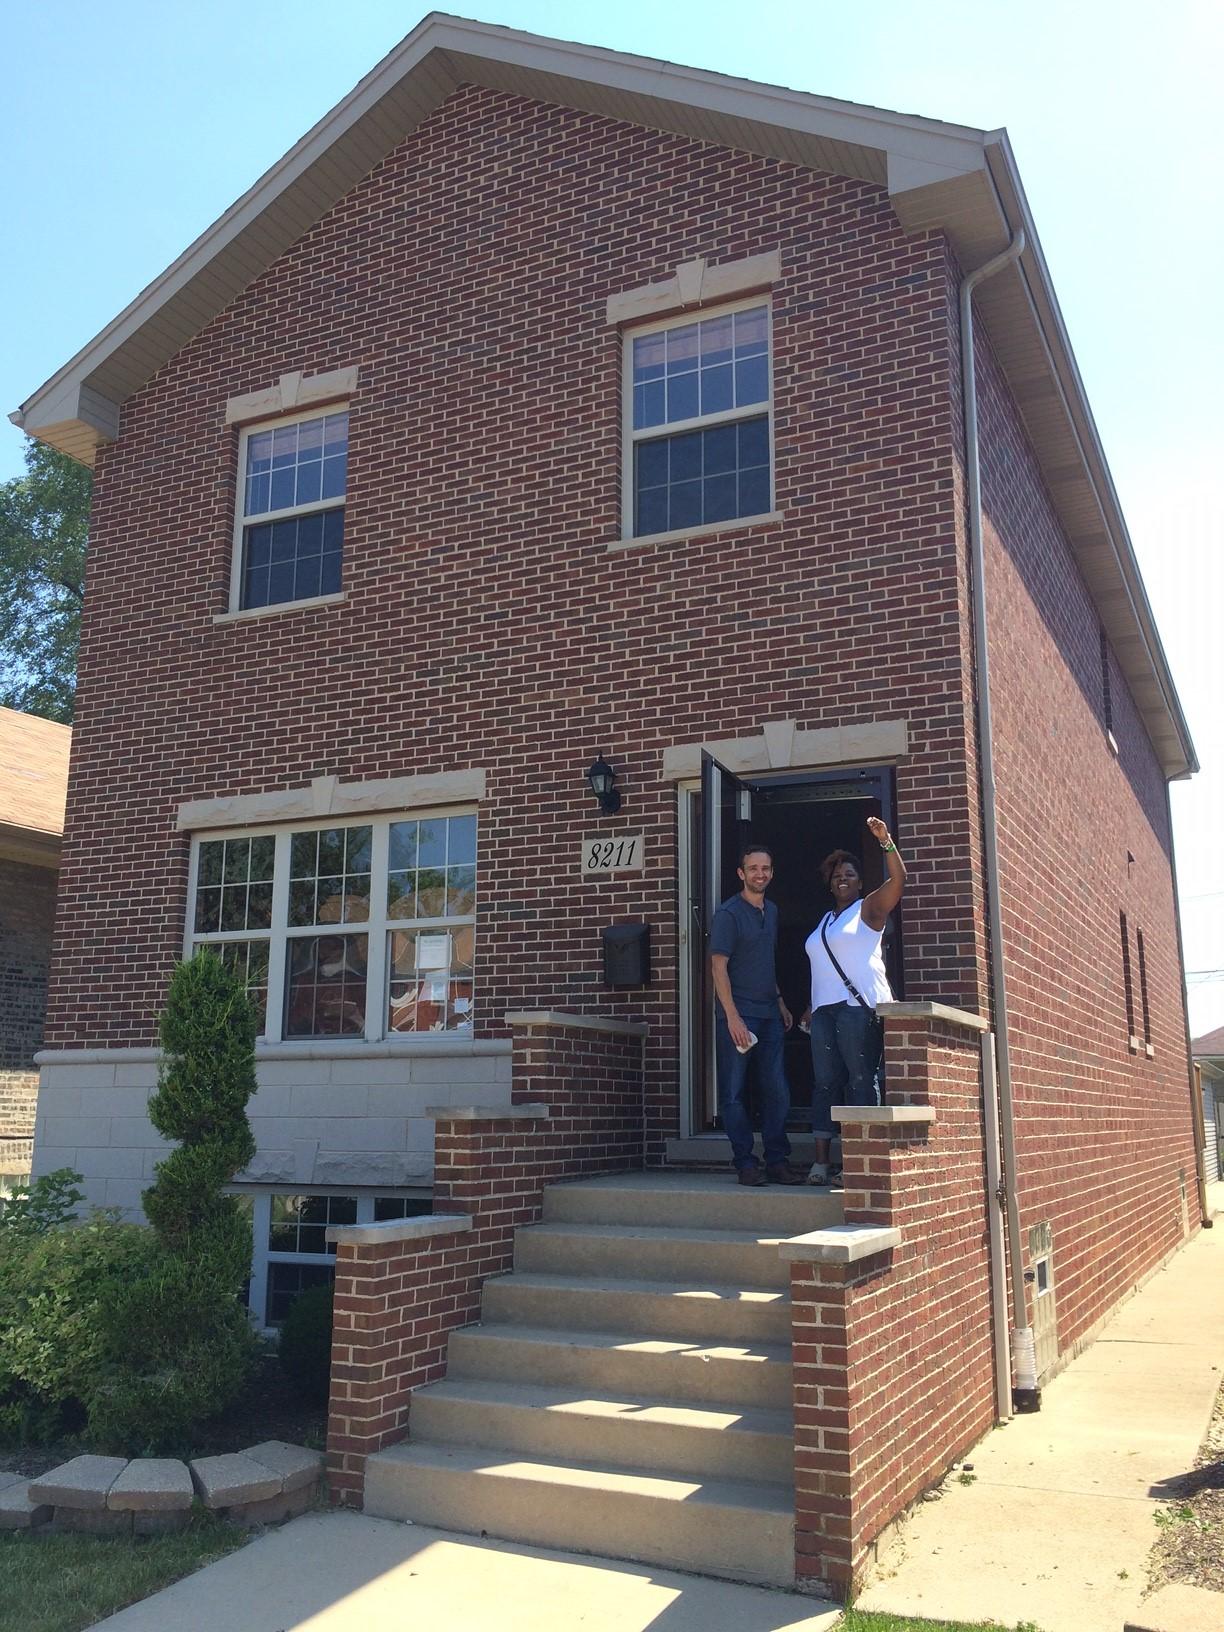 Homebuyer Direct Program – Cook County Land Bank Authority